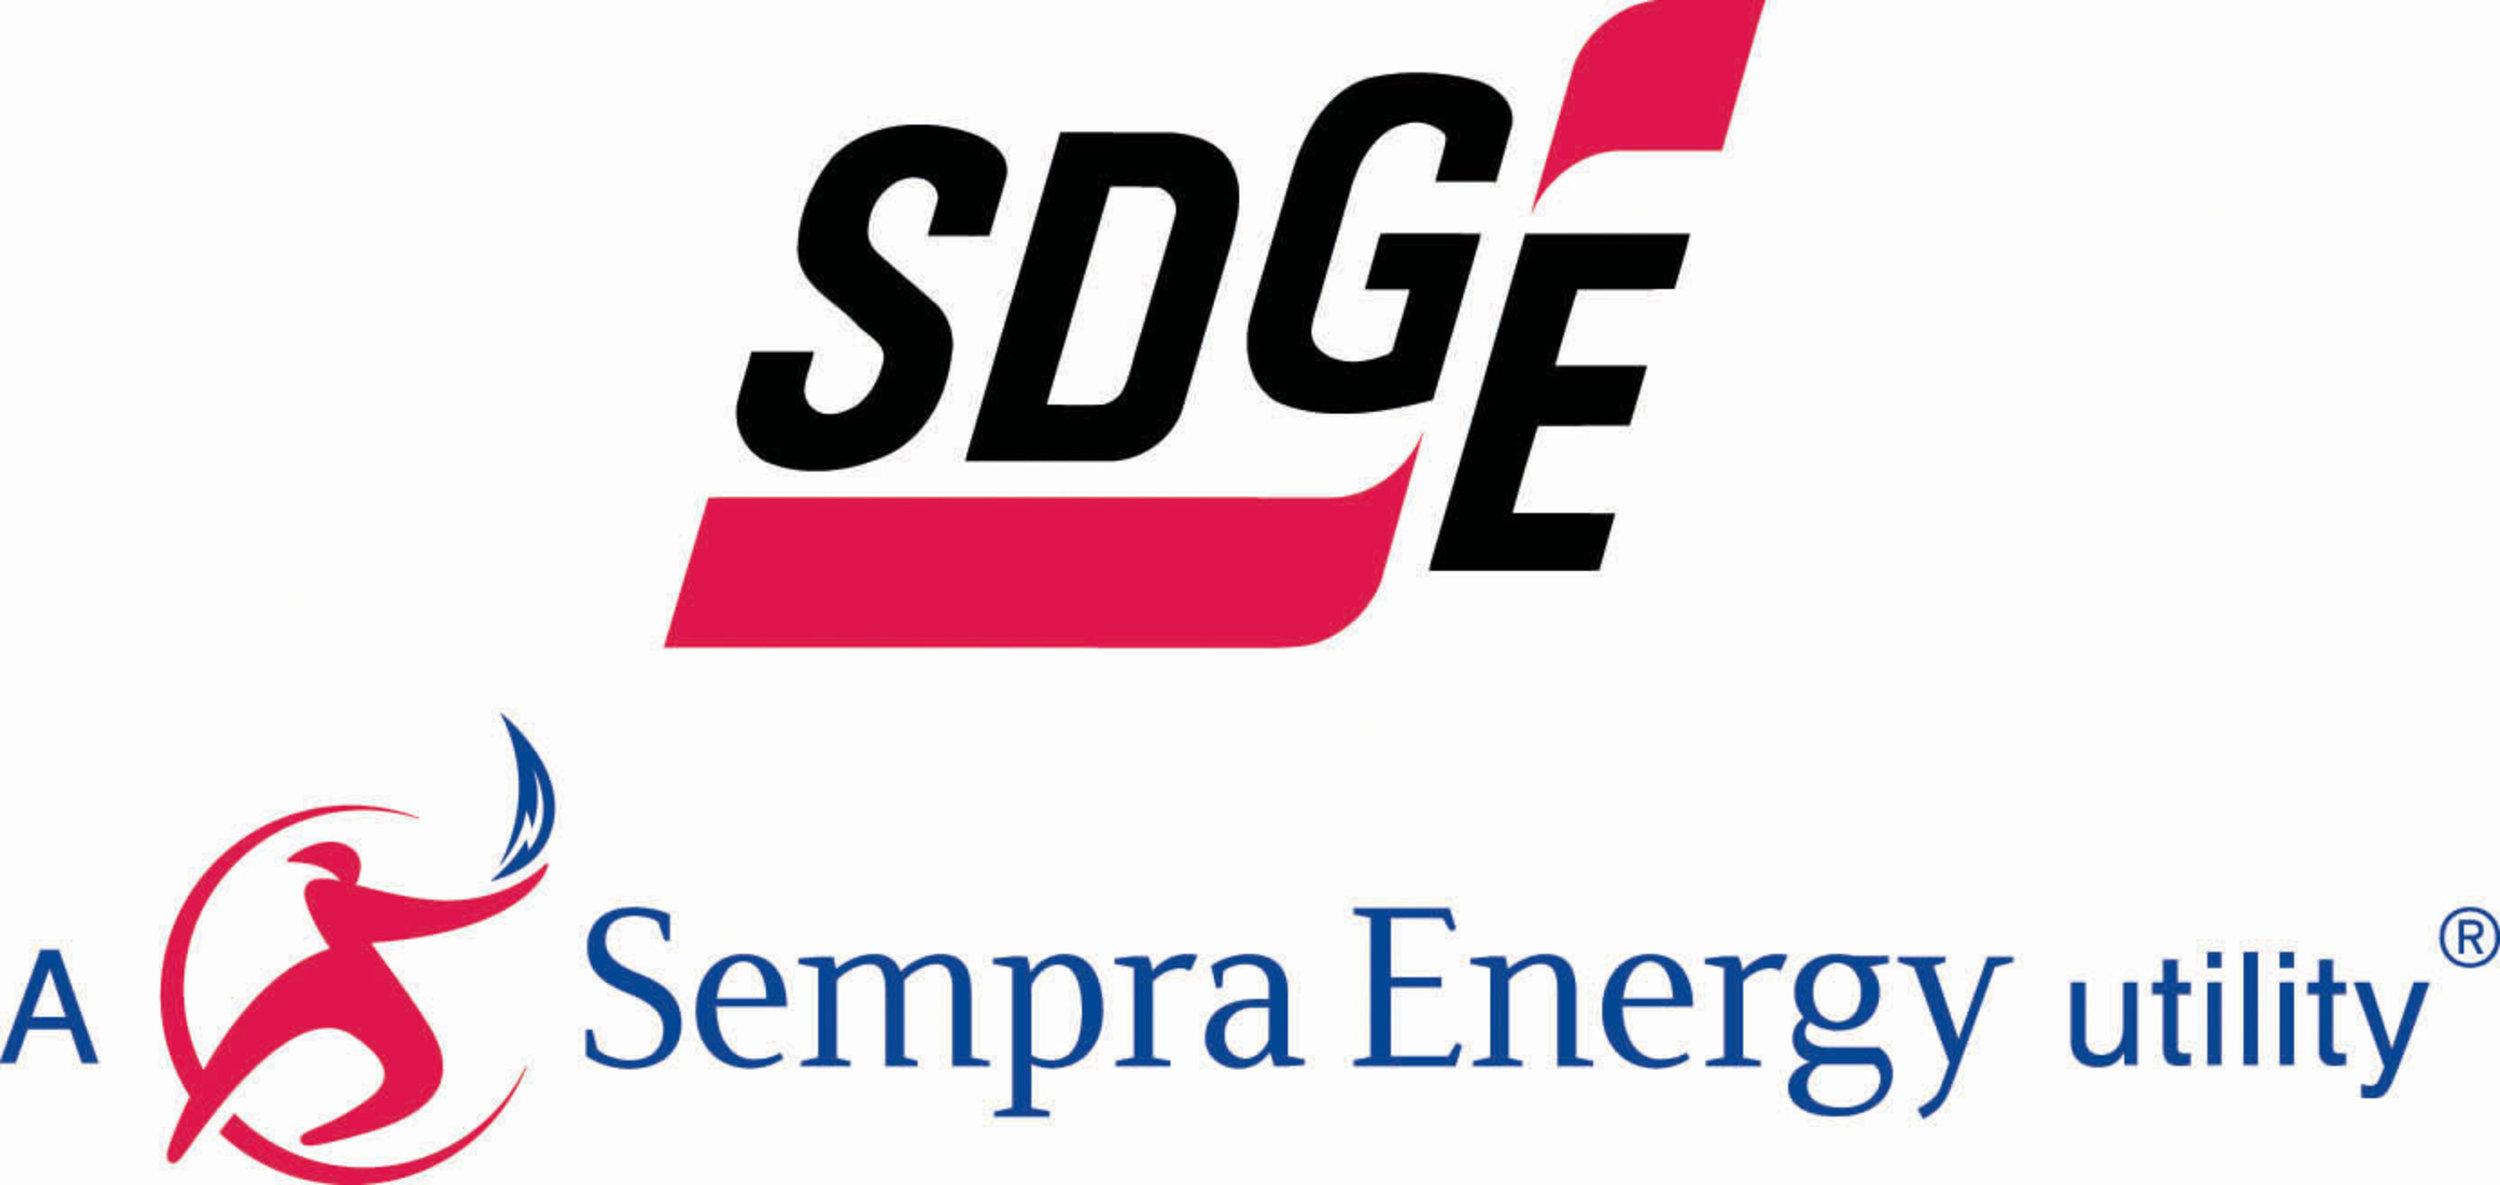 SDG&E - Servicing San Diego1.800.411.7343